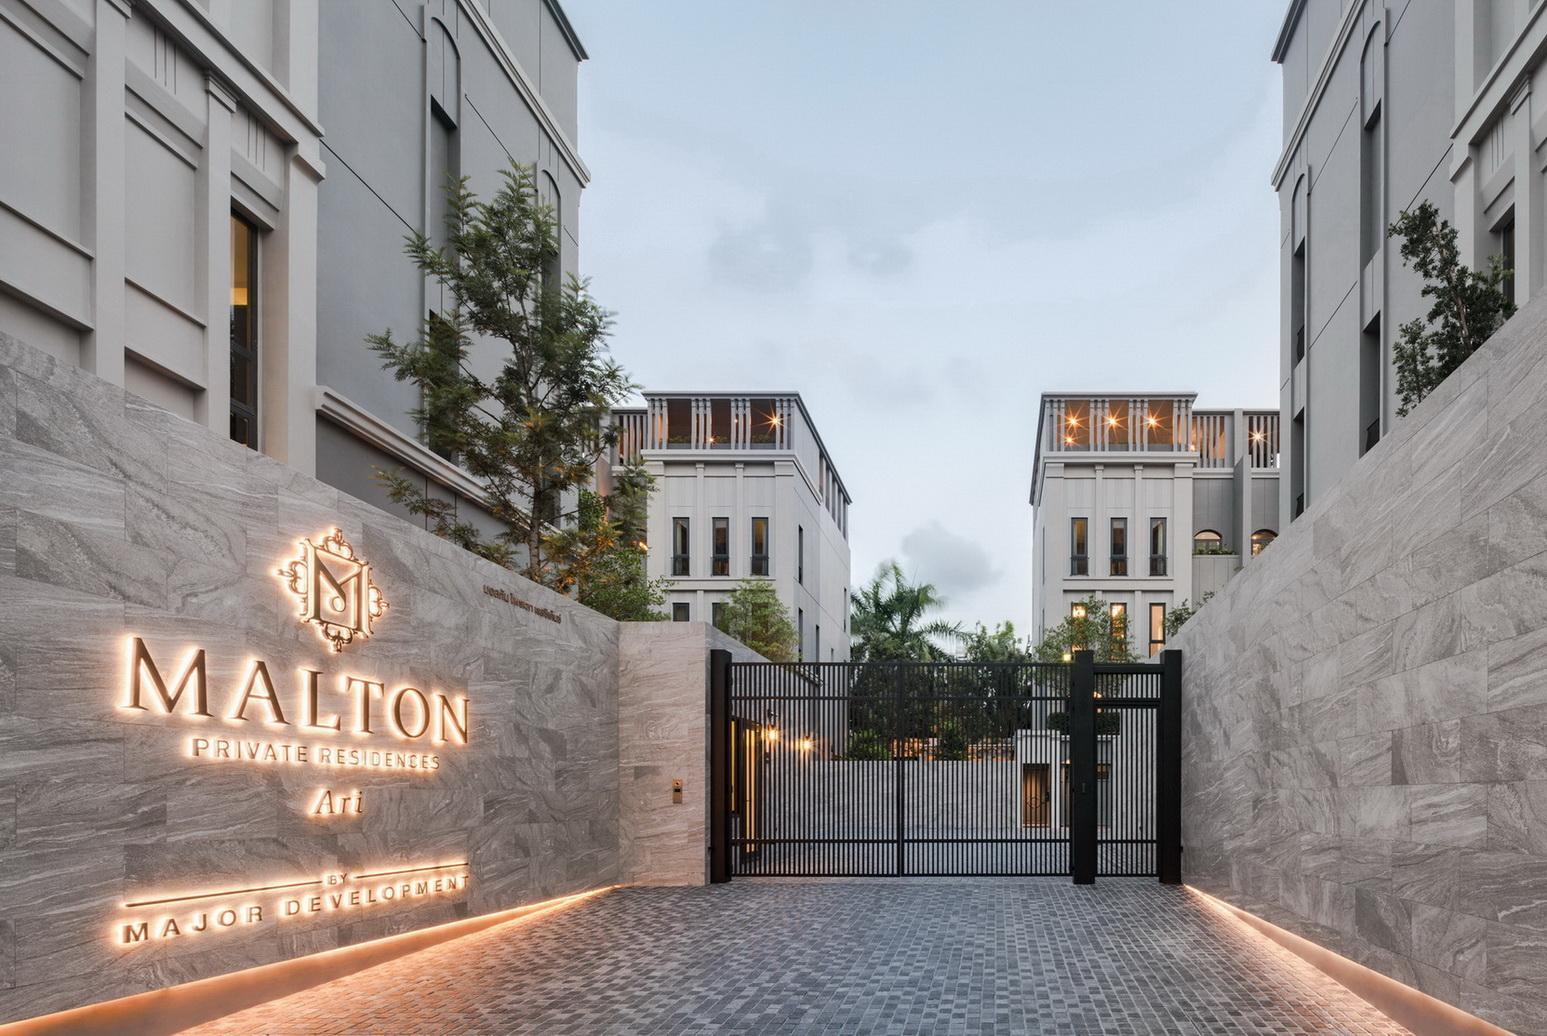 Malton Private Residences